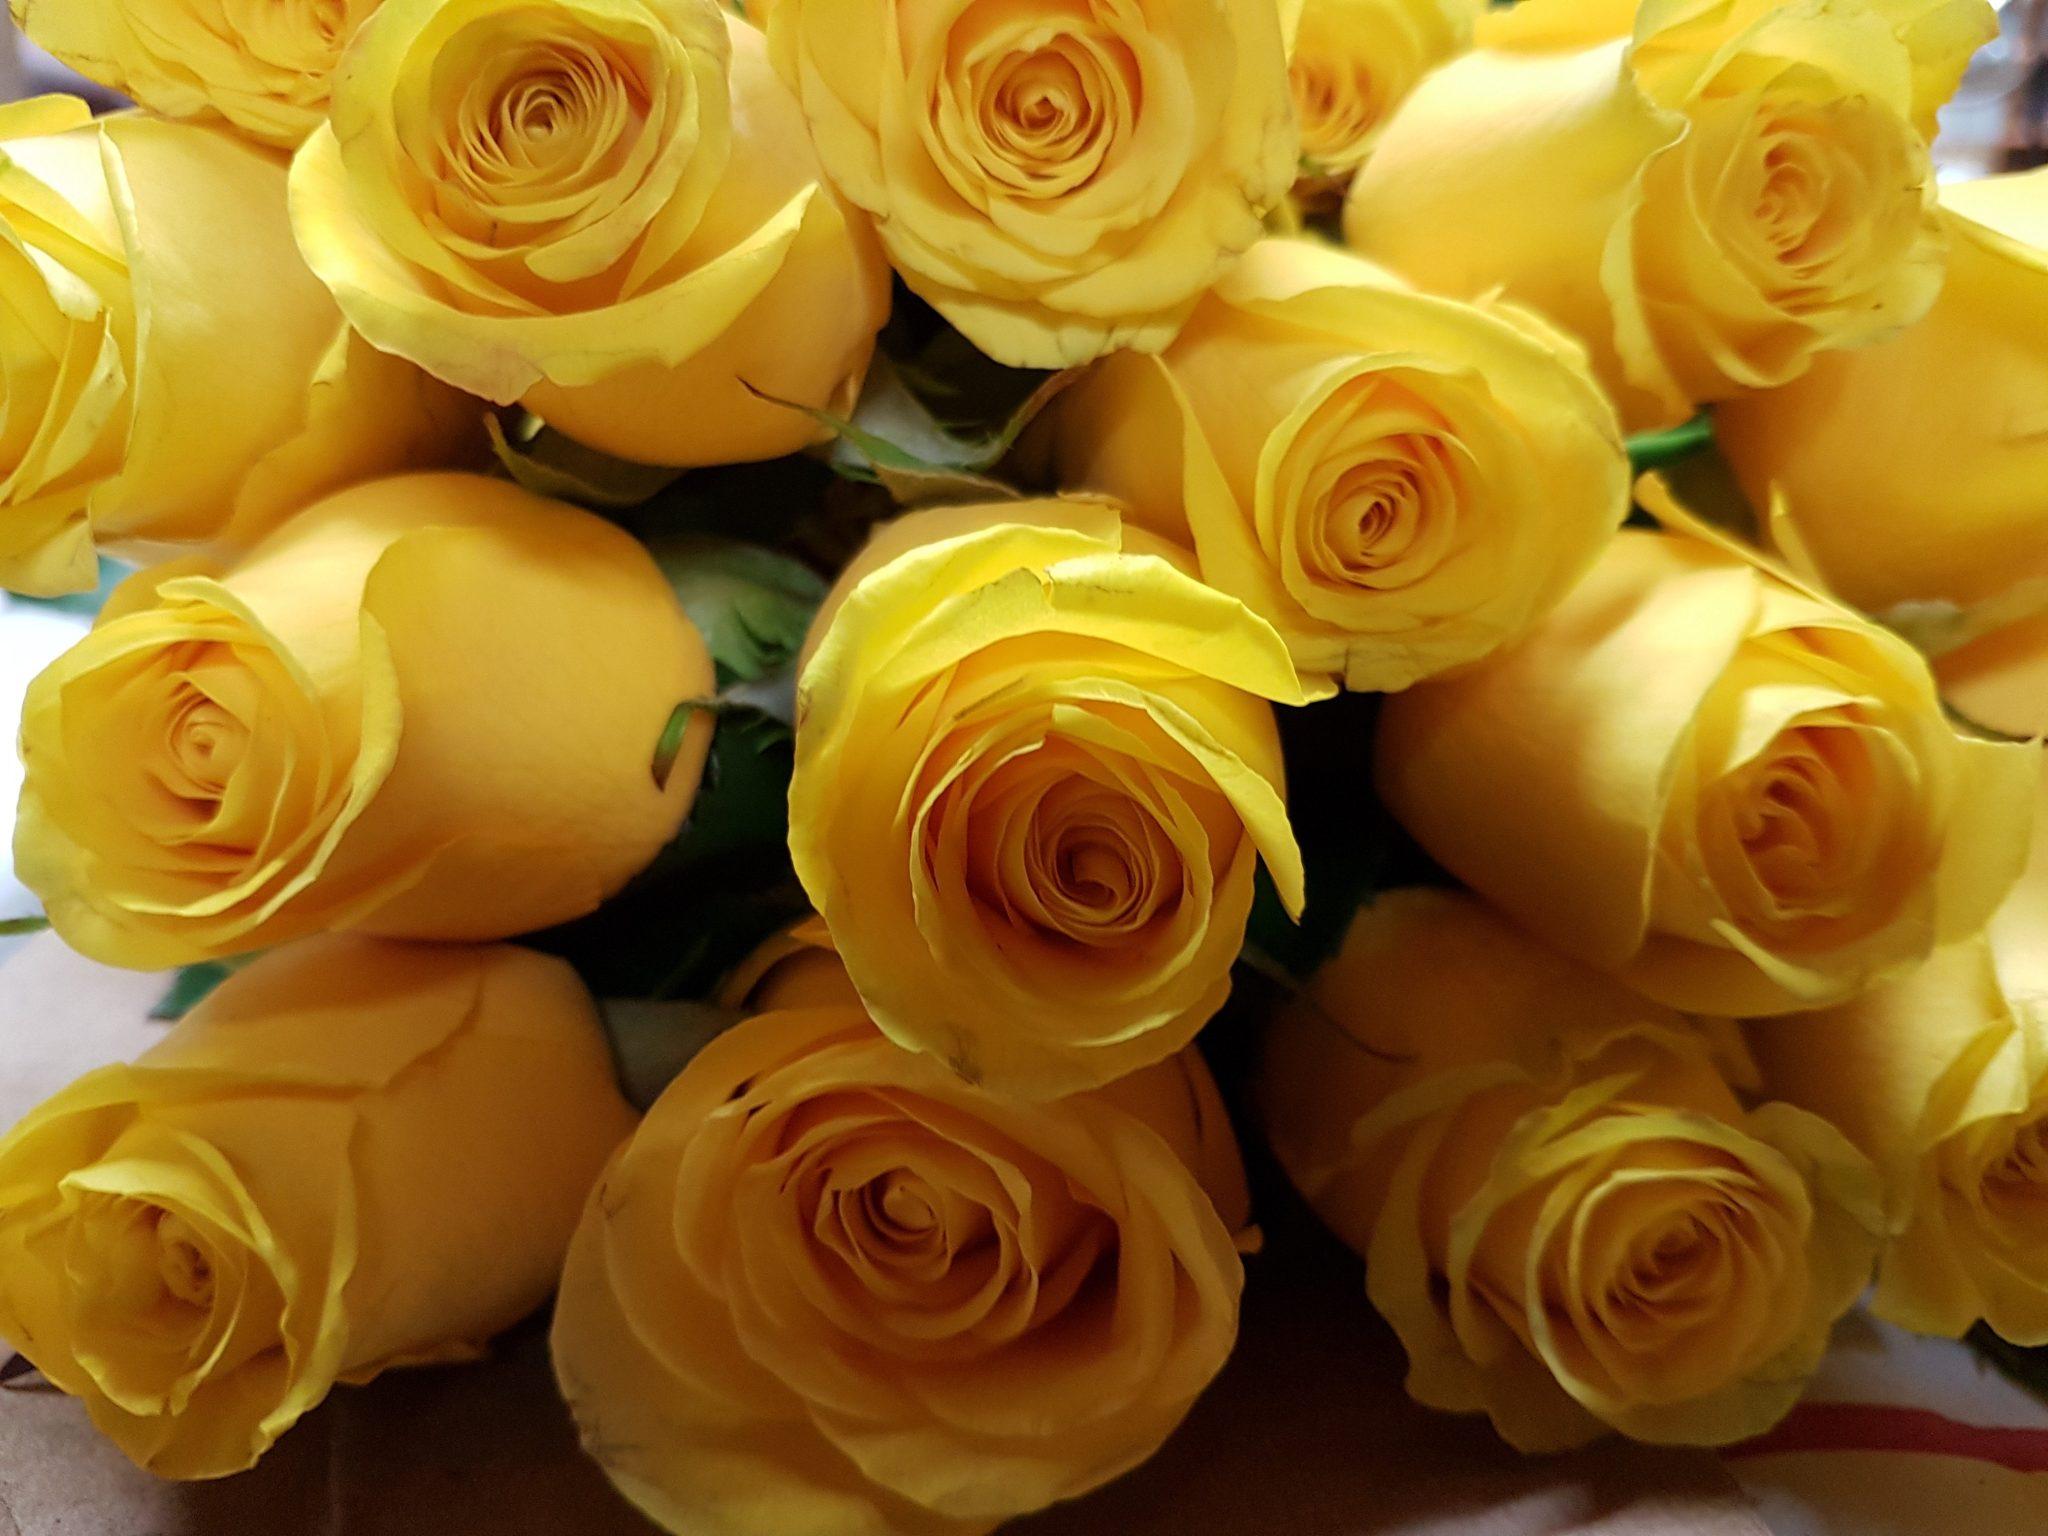 Bulk yellow roses 100 stems 40 cm toronto bulk flowers bulk yellow roses mightylinksfo